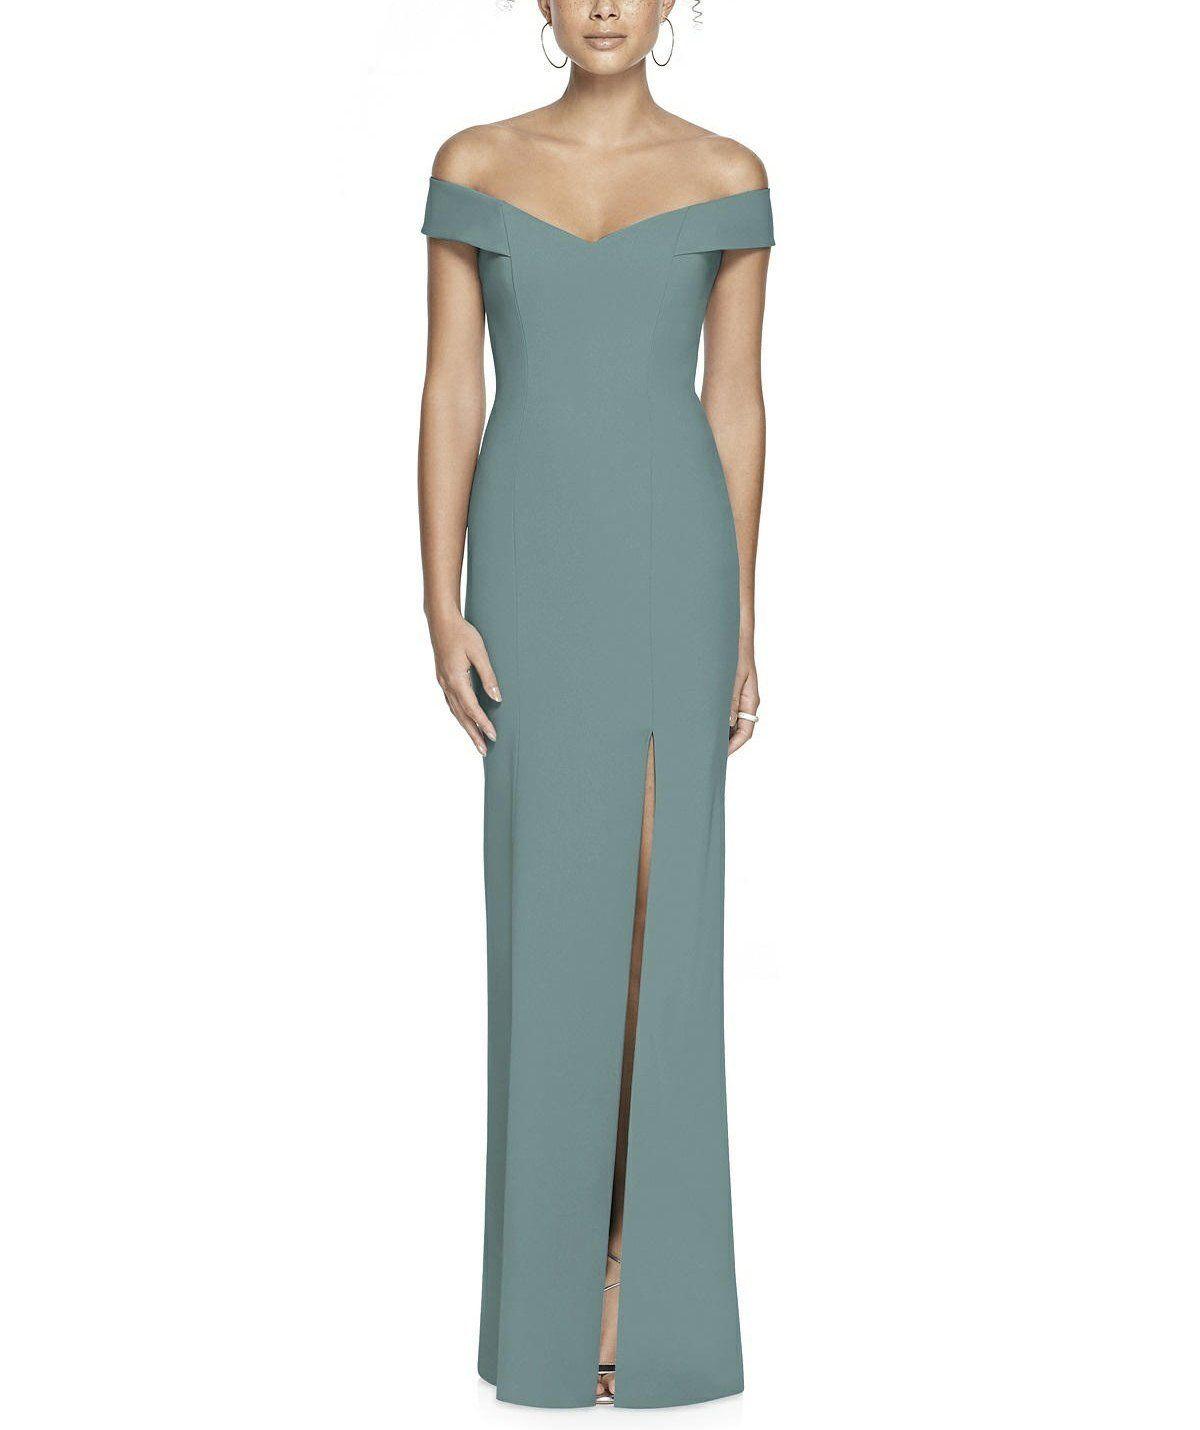 b28e95e386e Description - Dessy Collection Style 3012 - Full length bridesmaid dress -  Off the shoulder -